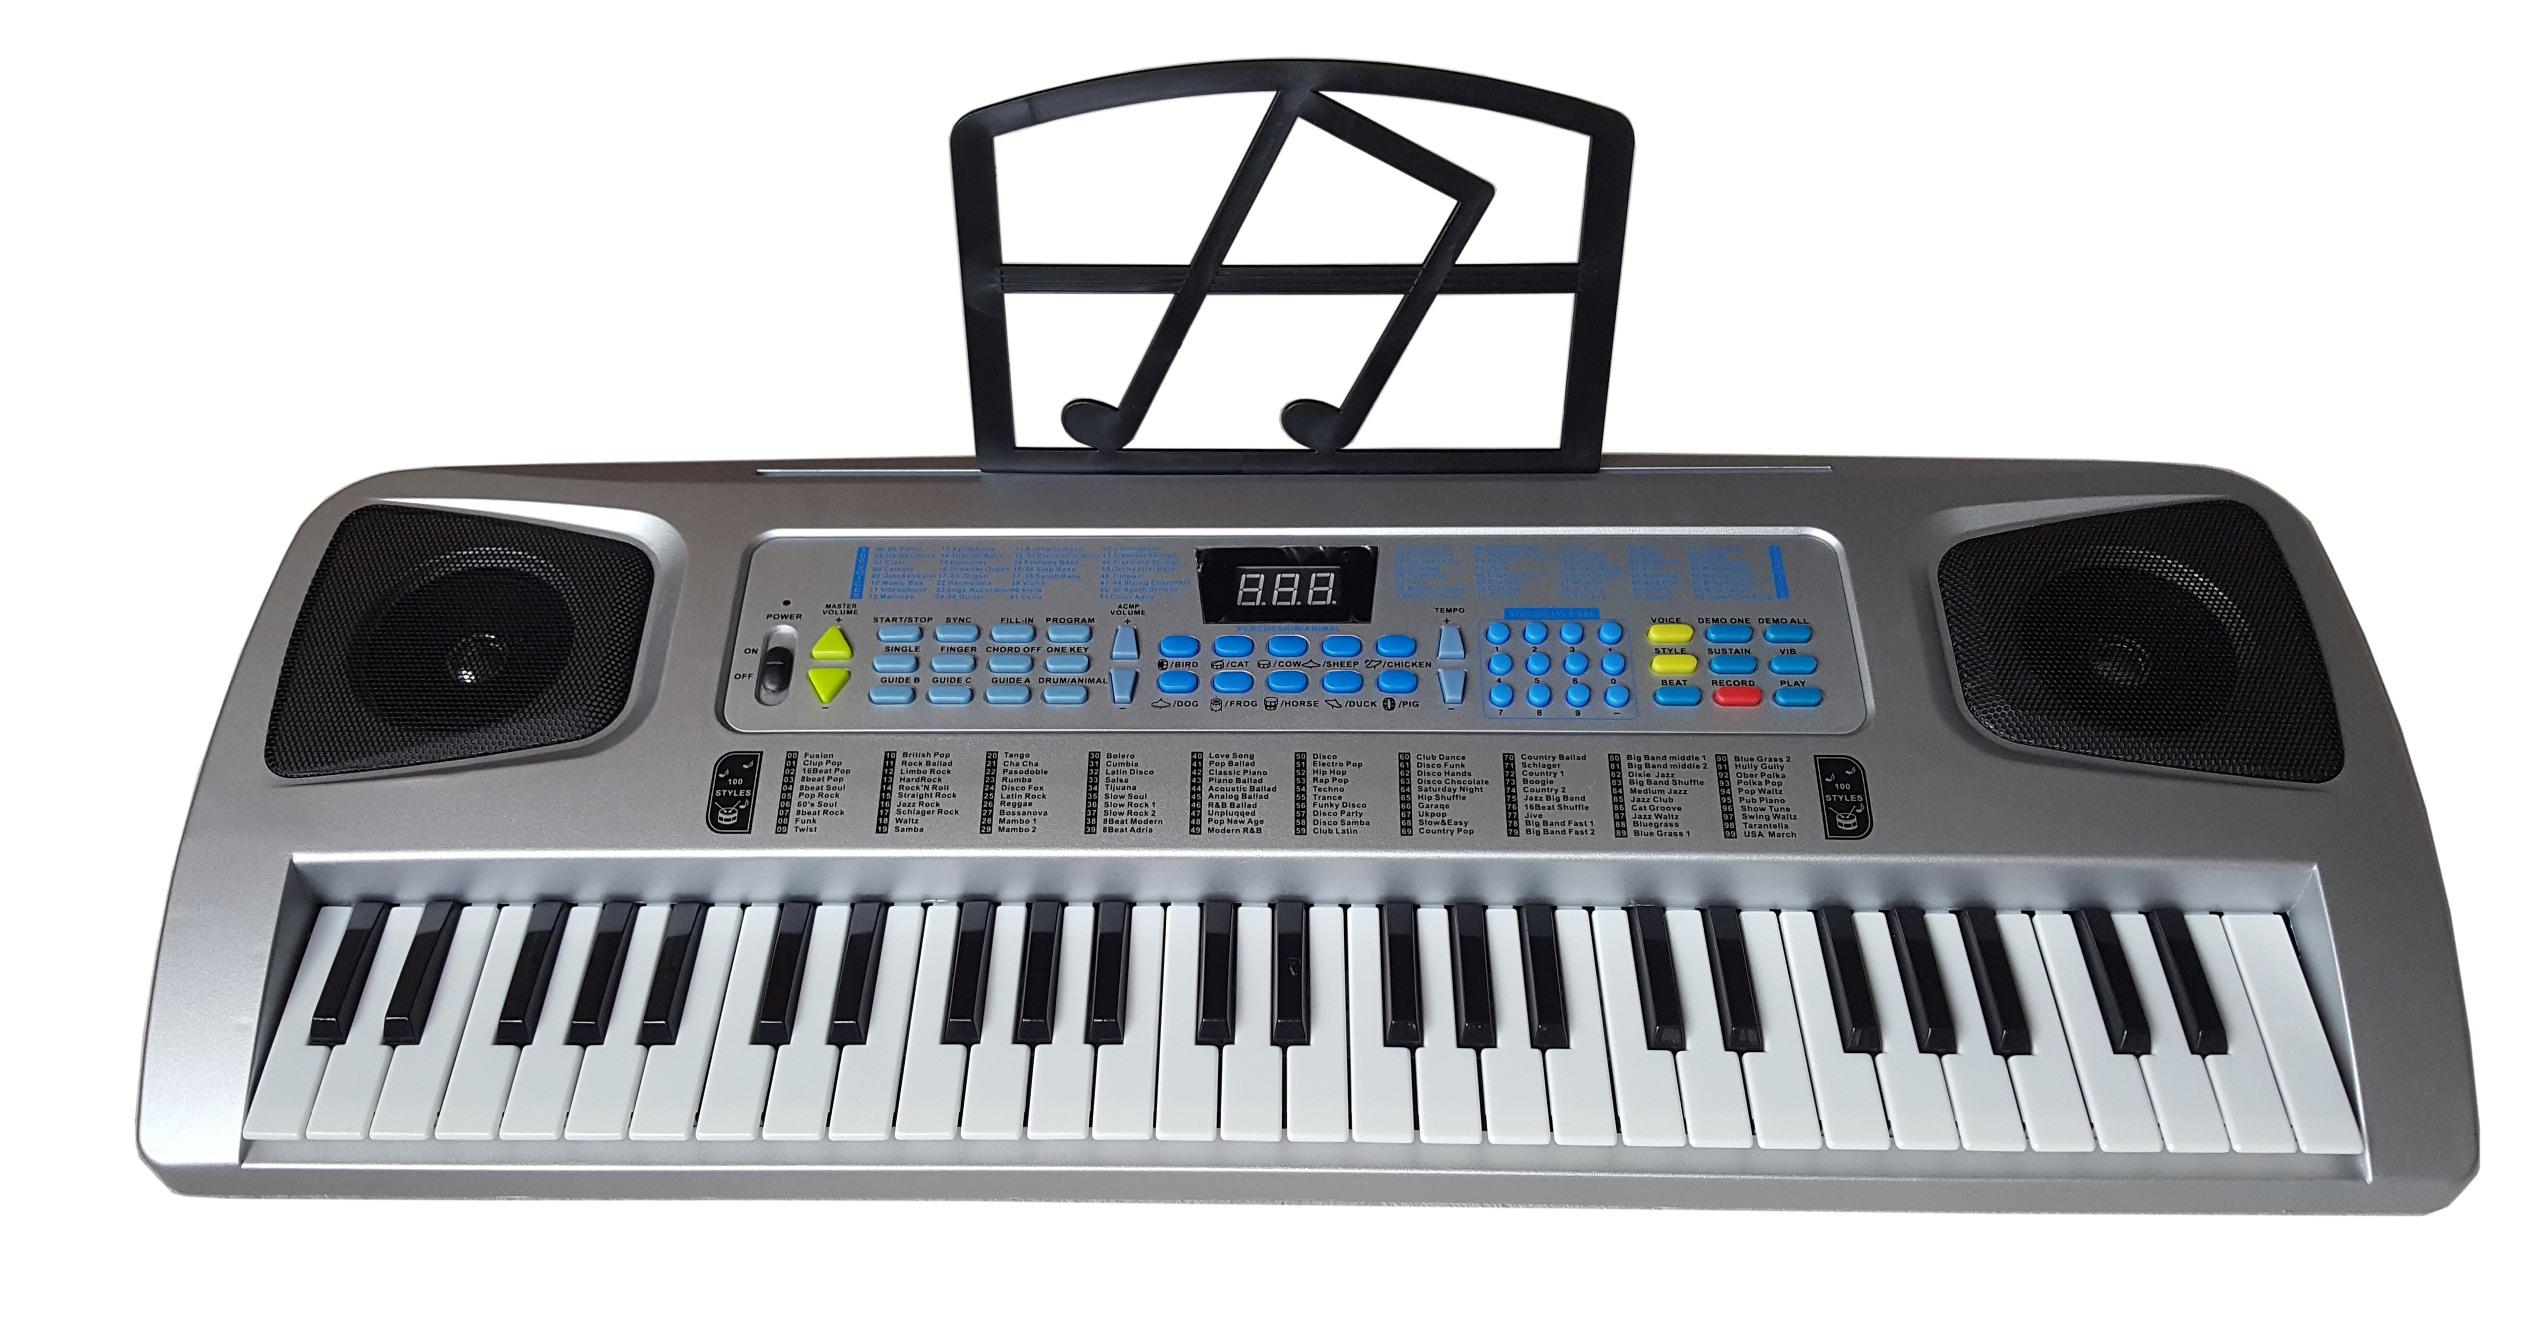 Lernfunktion 100 Sounds//Rythmen Fun Keyboard Notenhalter Netzteil 54 Tasten